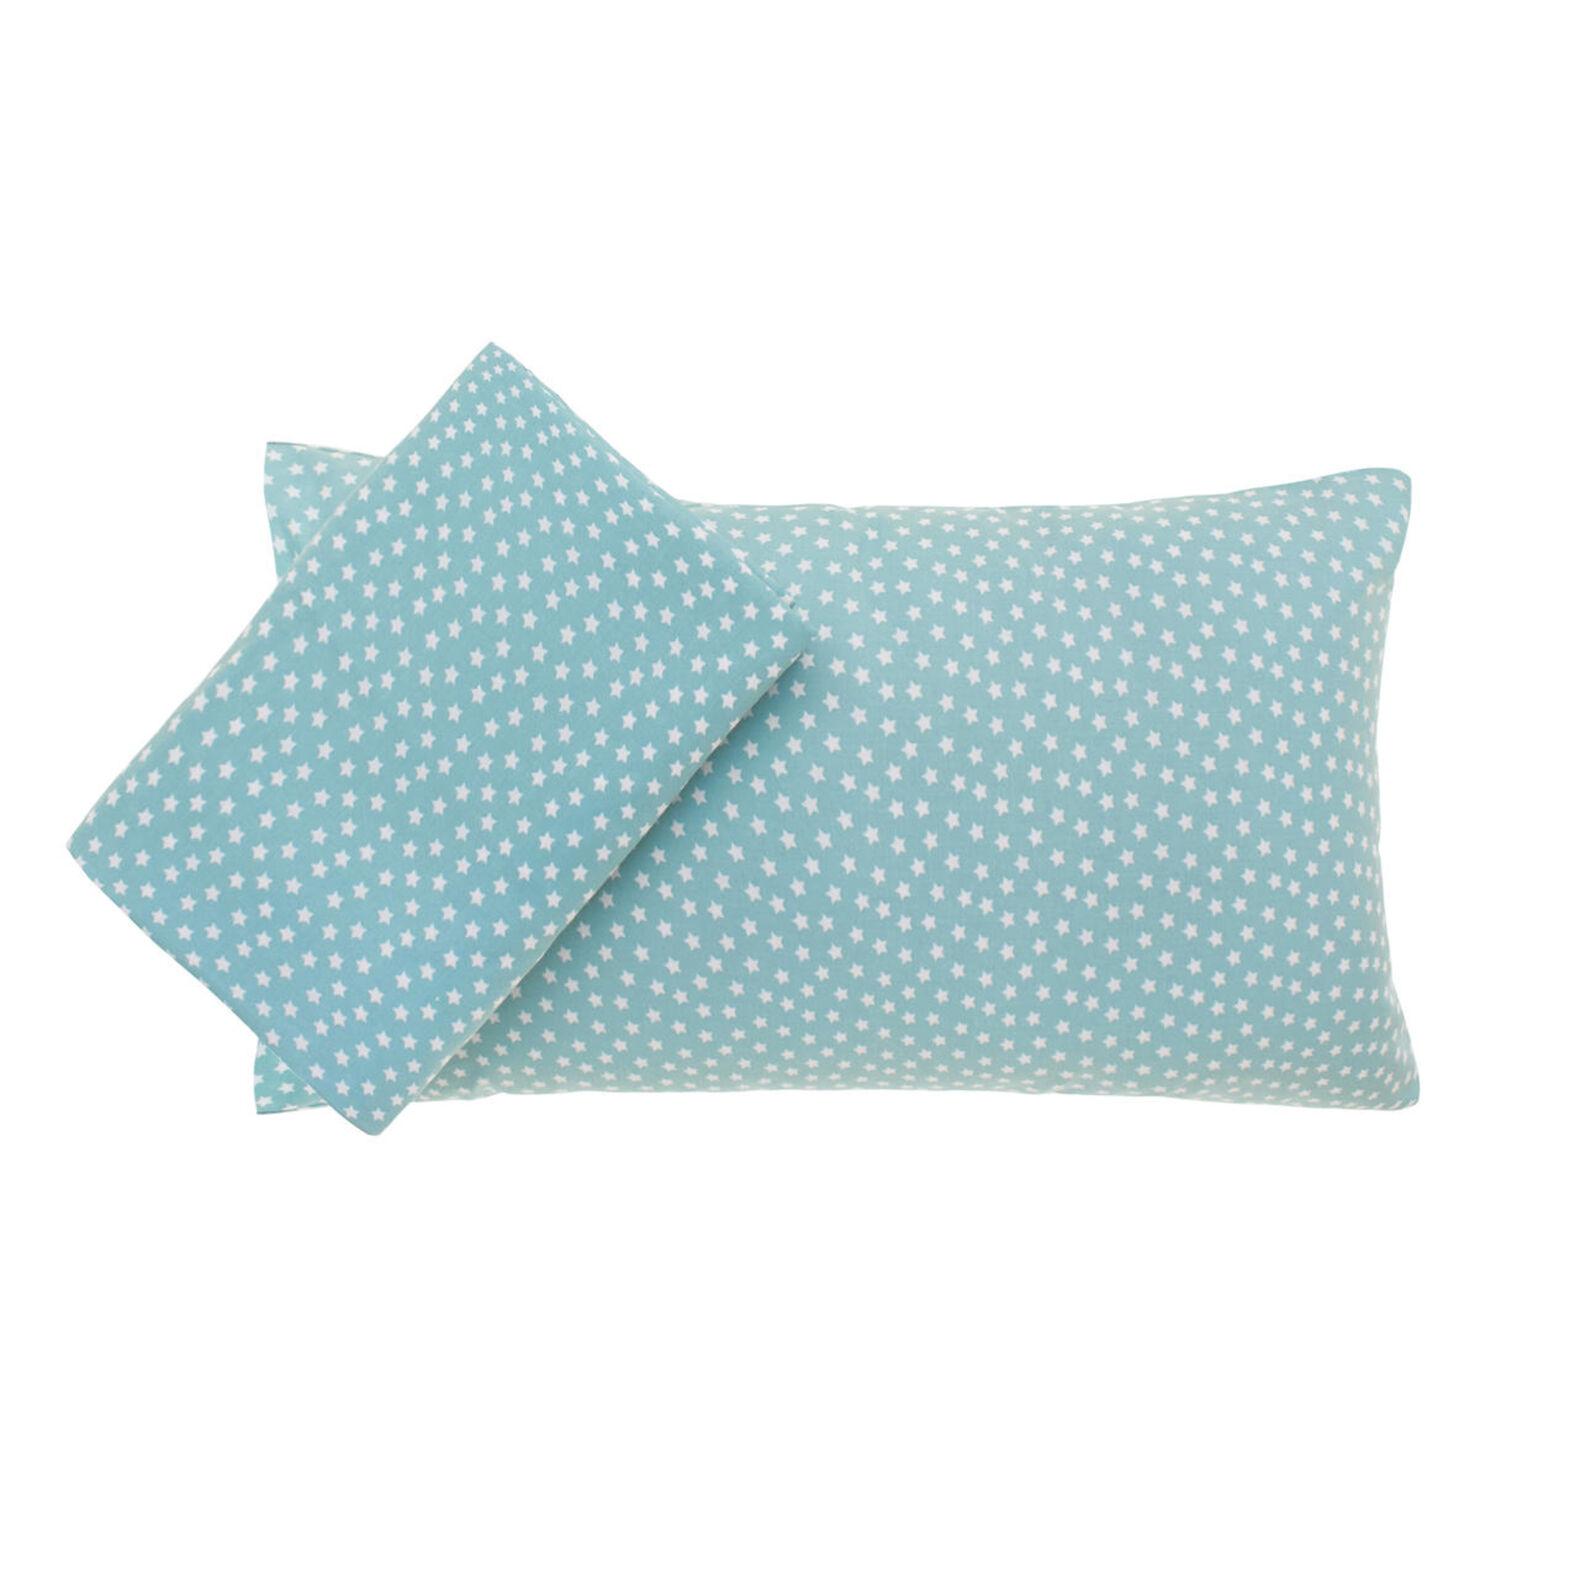 100% cotton star duvet cover set